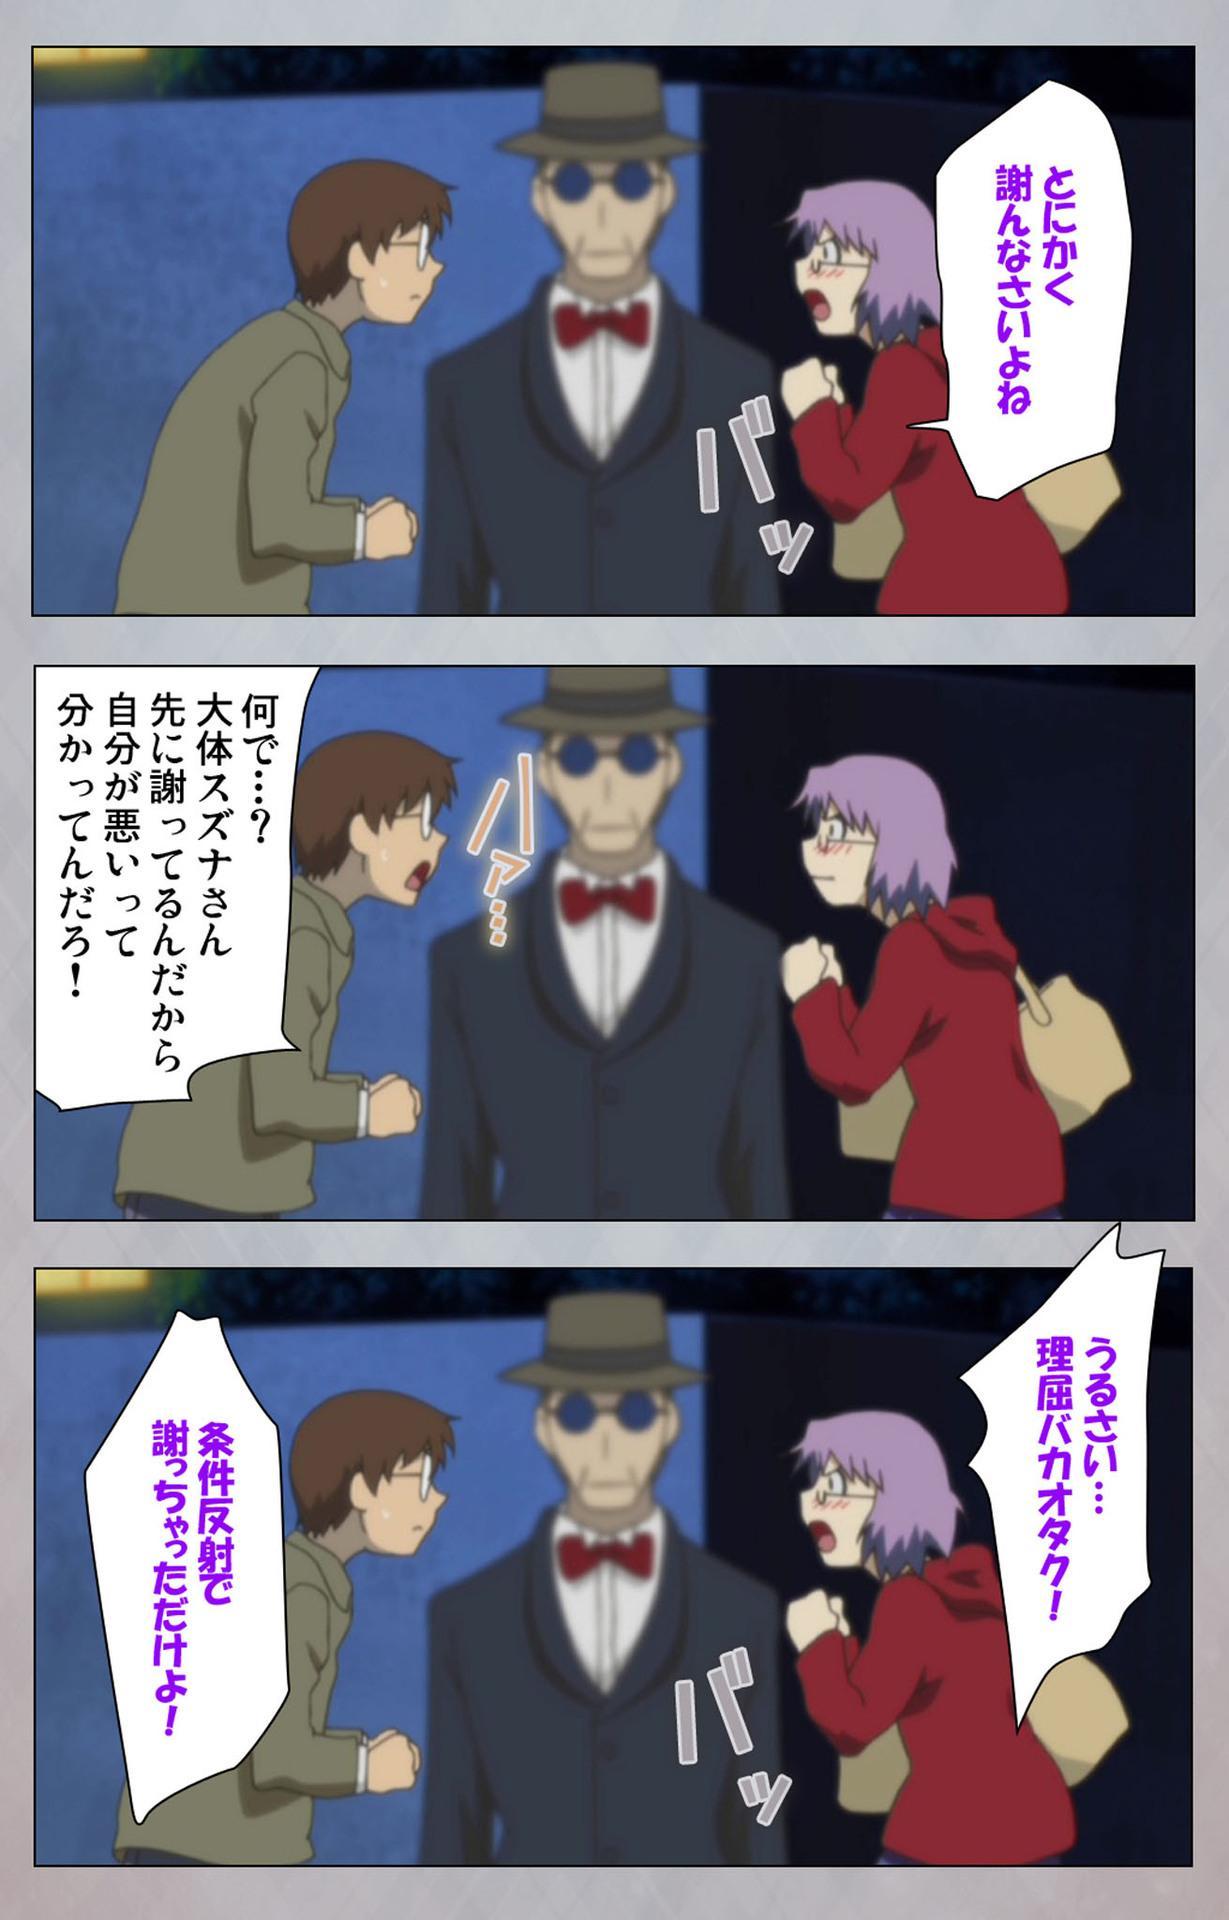 [Digital Works] [Full Color Seijin Ban] Sex Android ~Risou no Onna de Nuite yaru~ Kanzenban 21